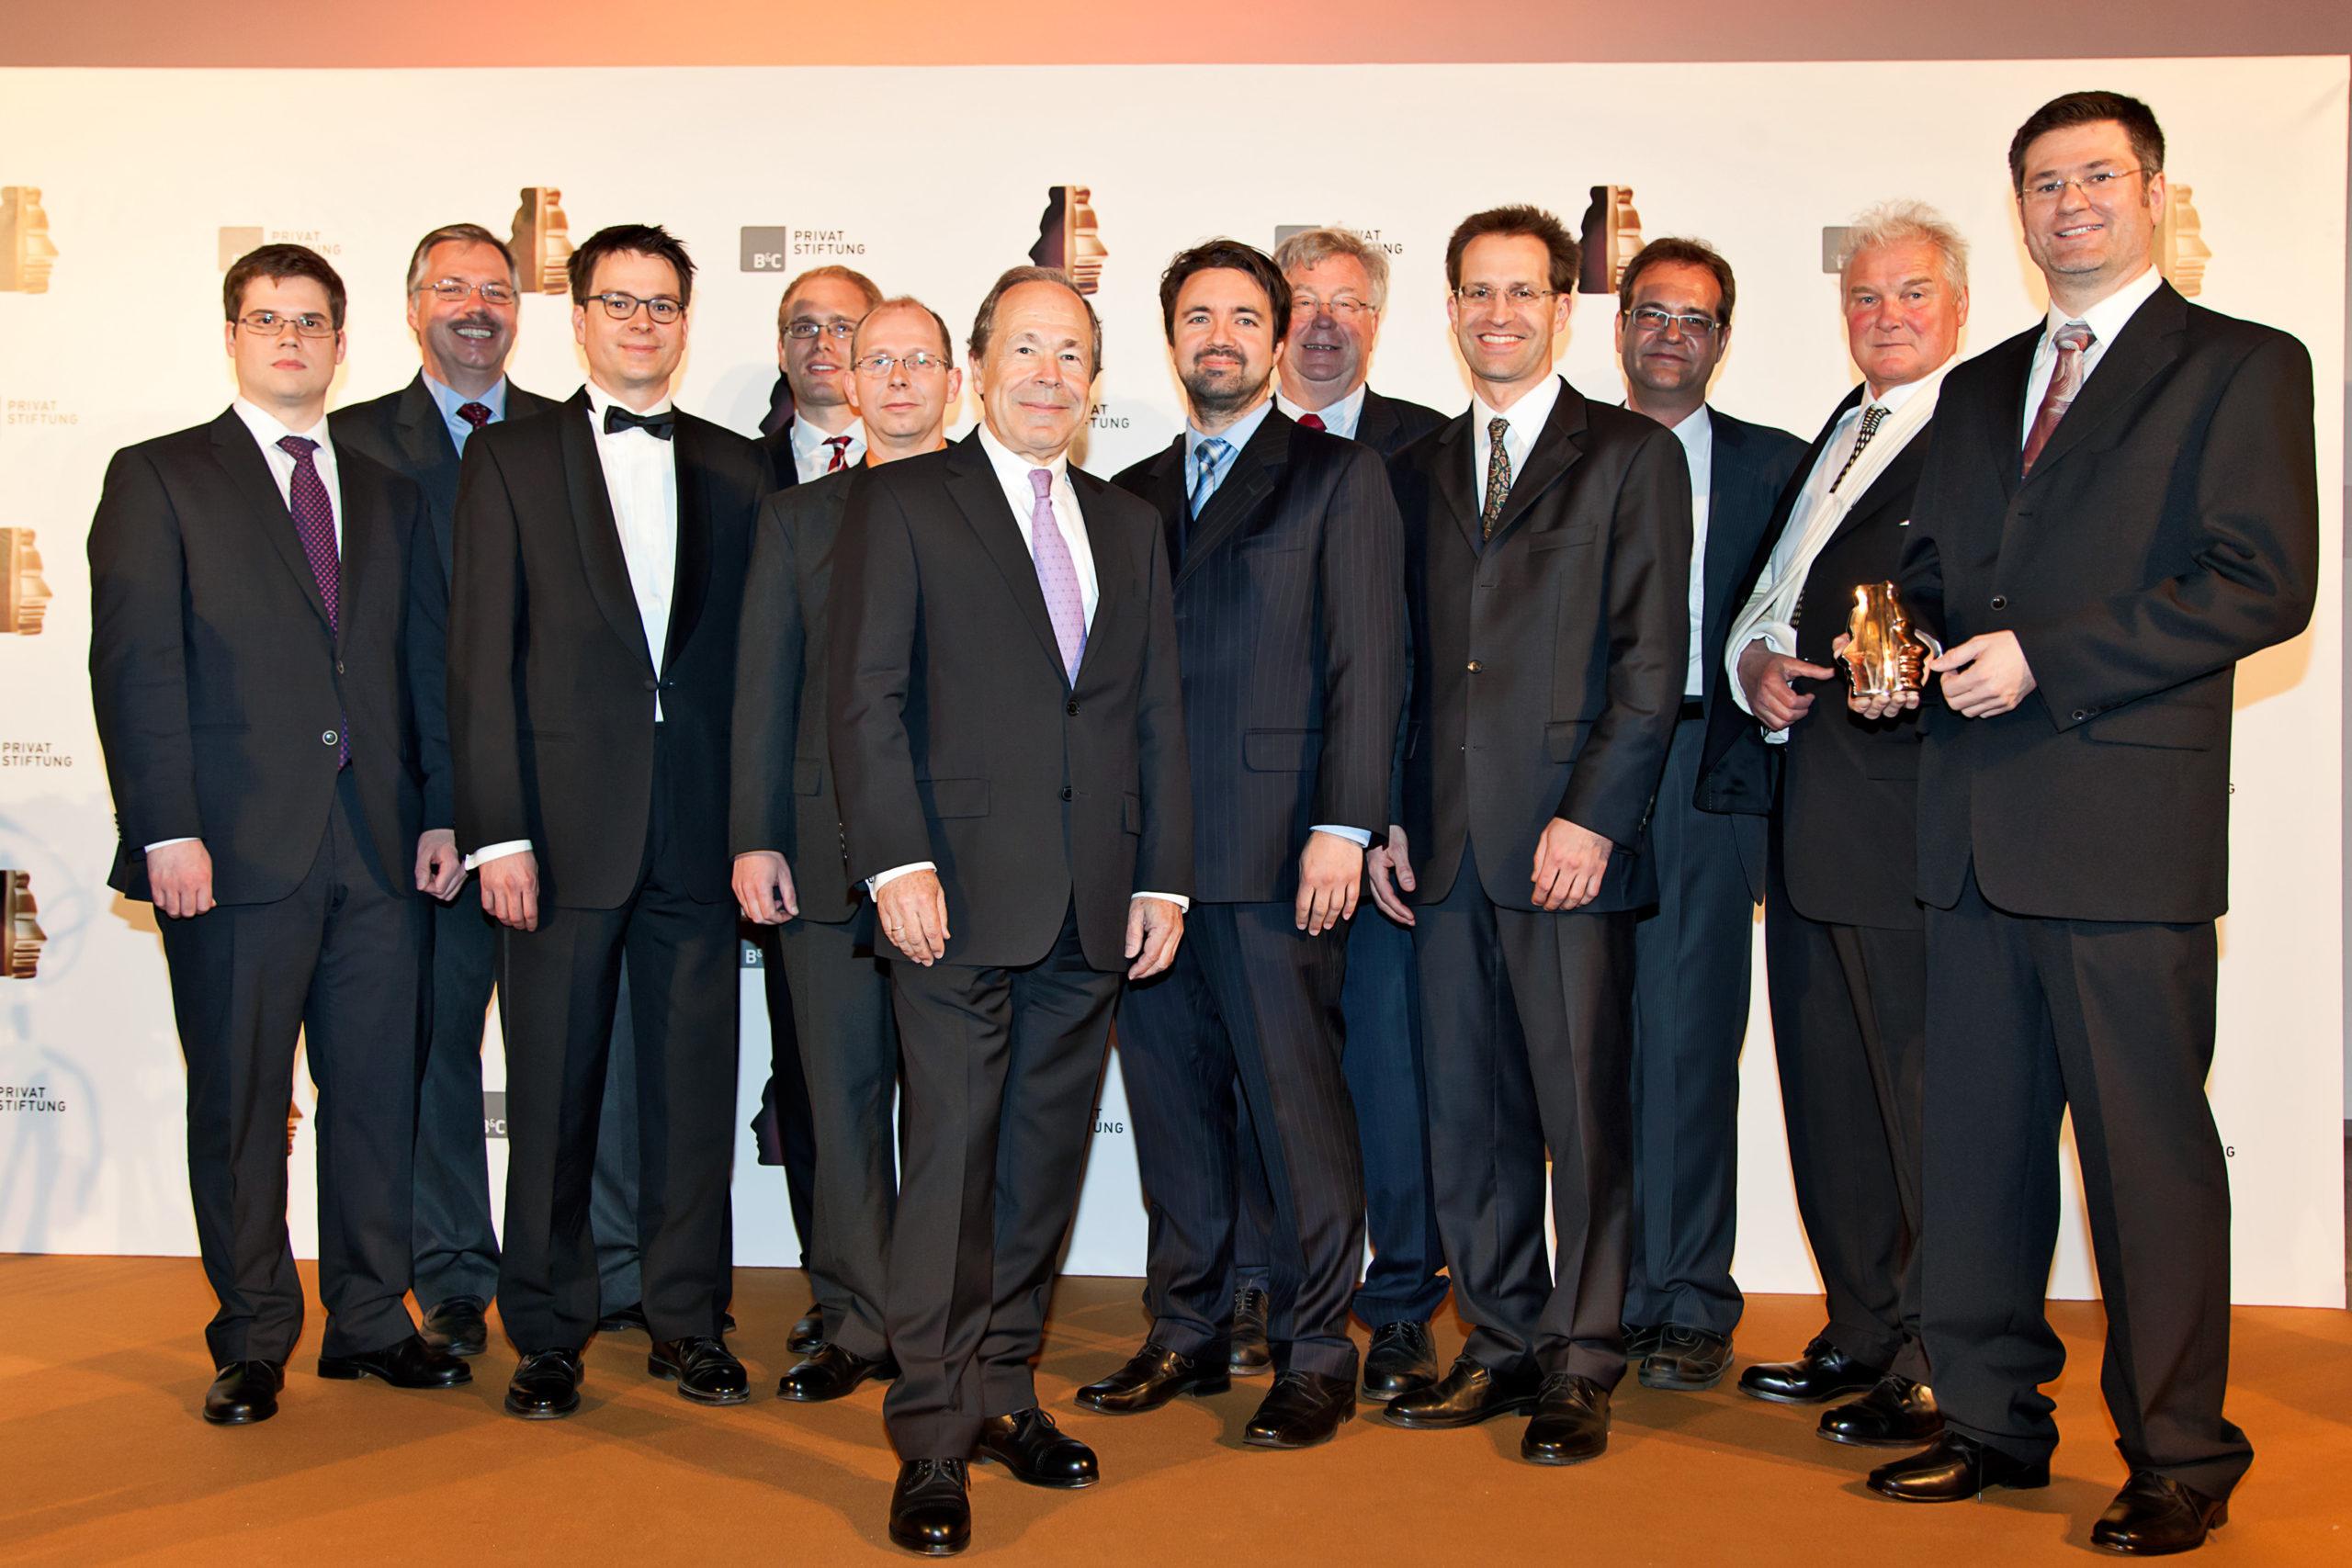 2. Platz Houskapreis 2014